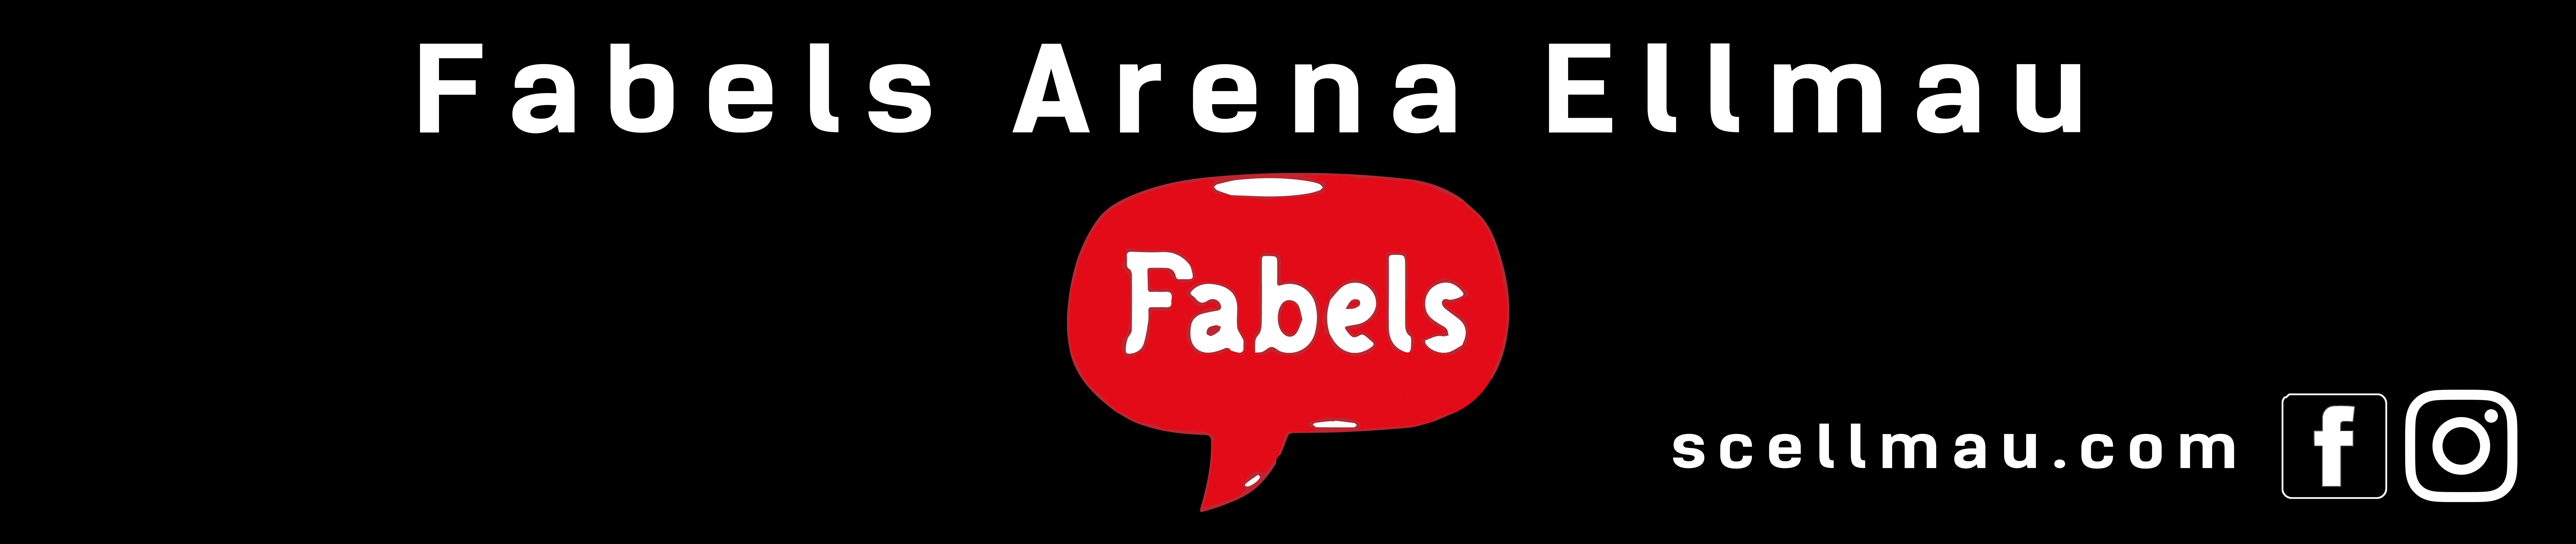 Fabels Arena